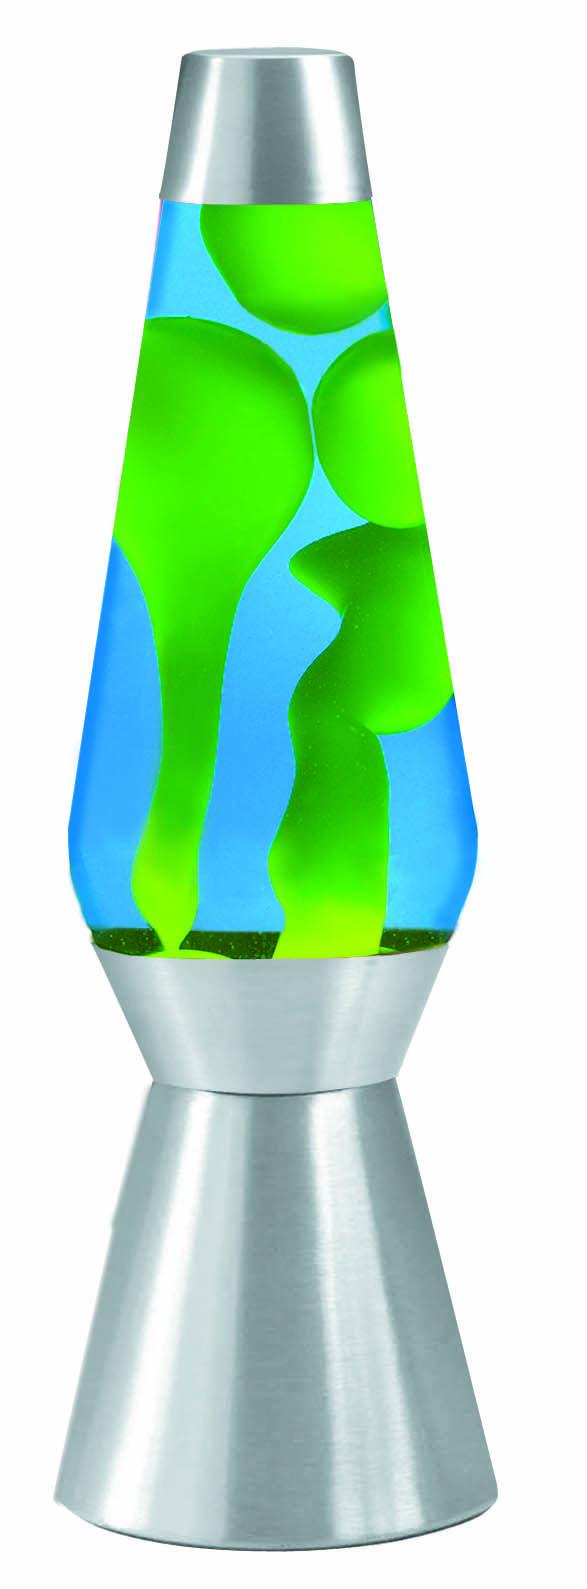 6824 27 Grande Lava Lamp Lava Lamp Lava Lamp Blue Lava Lamp Lamp